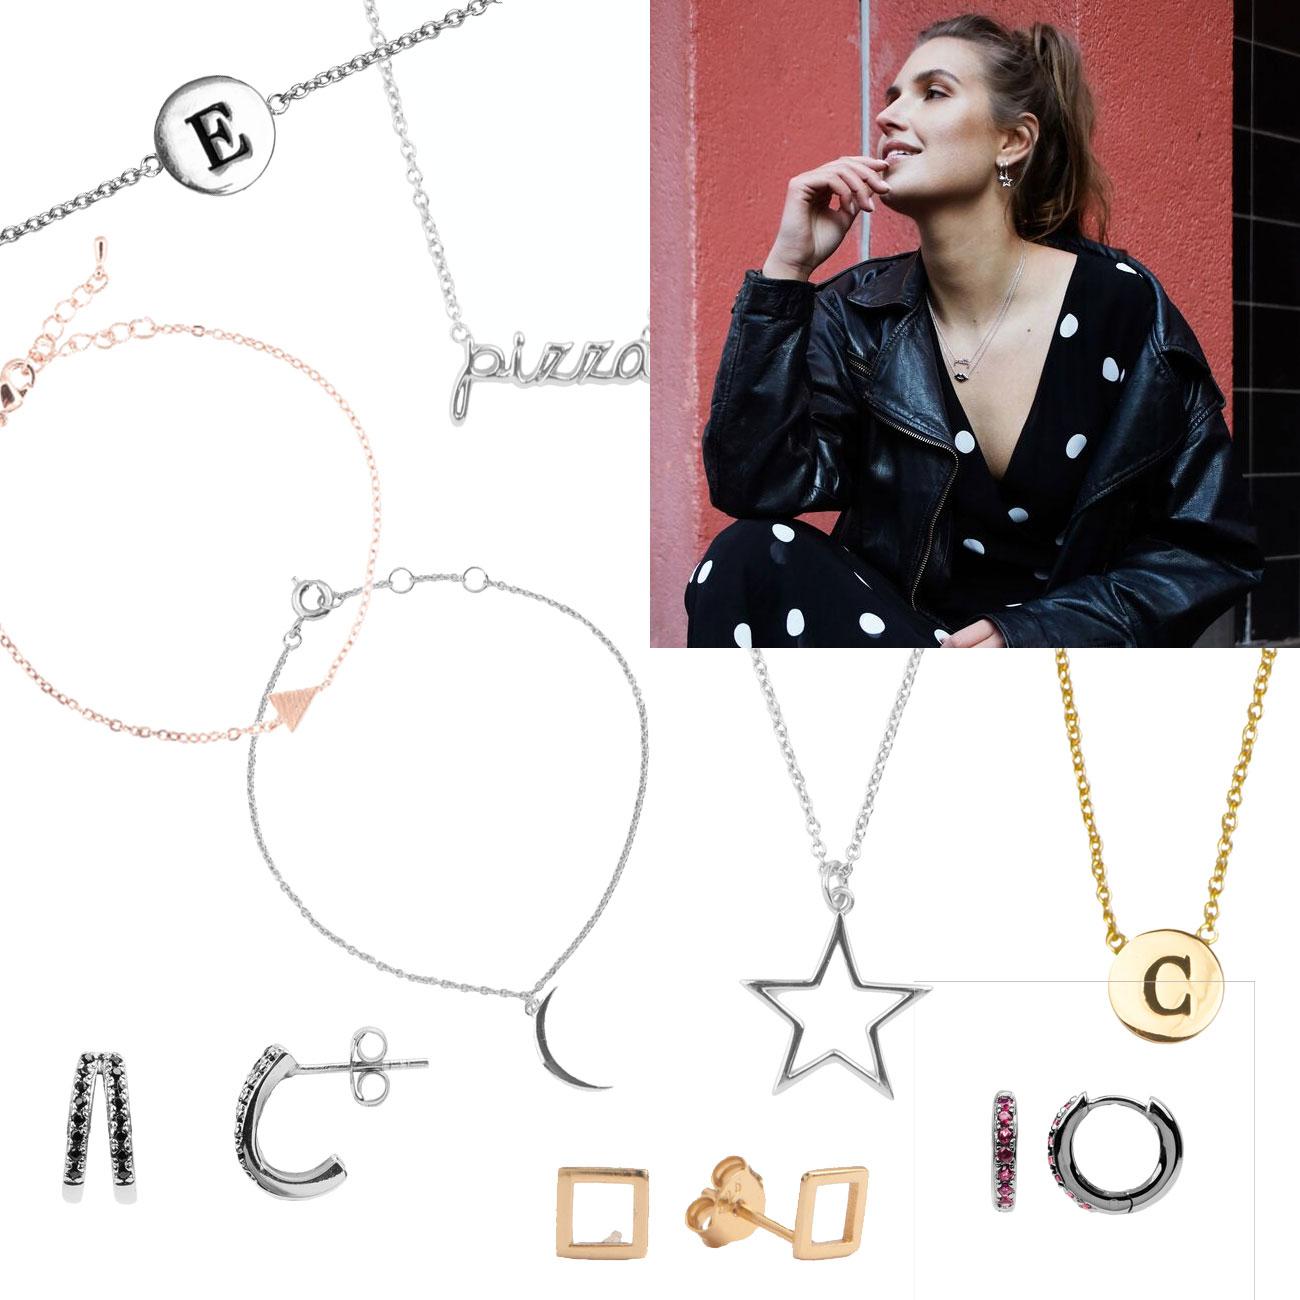 ATLITW sieraden -70% - nu vanaf €7,45 @ Omoda